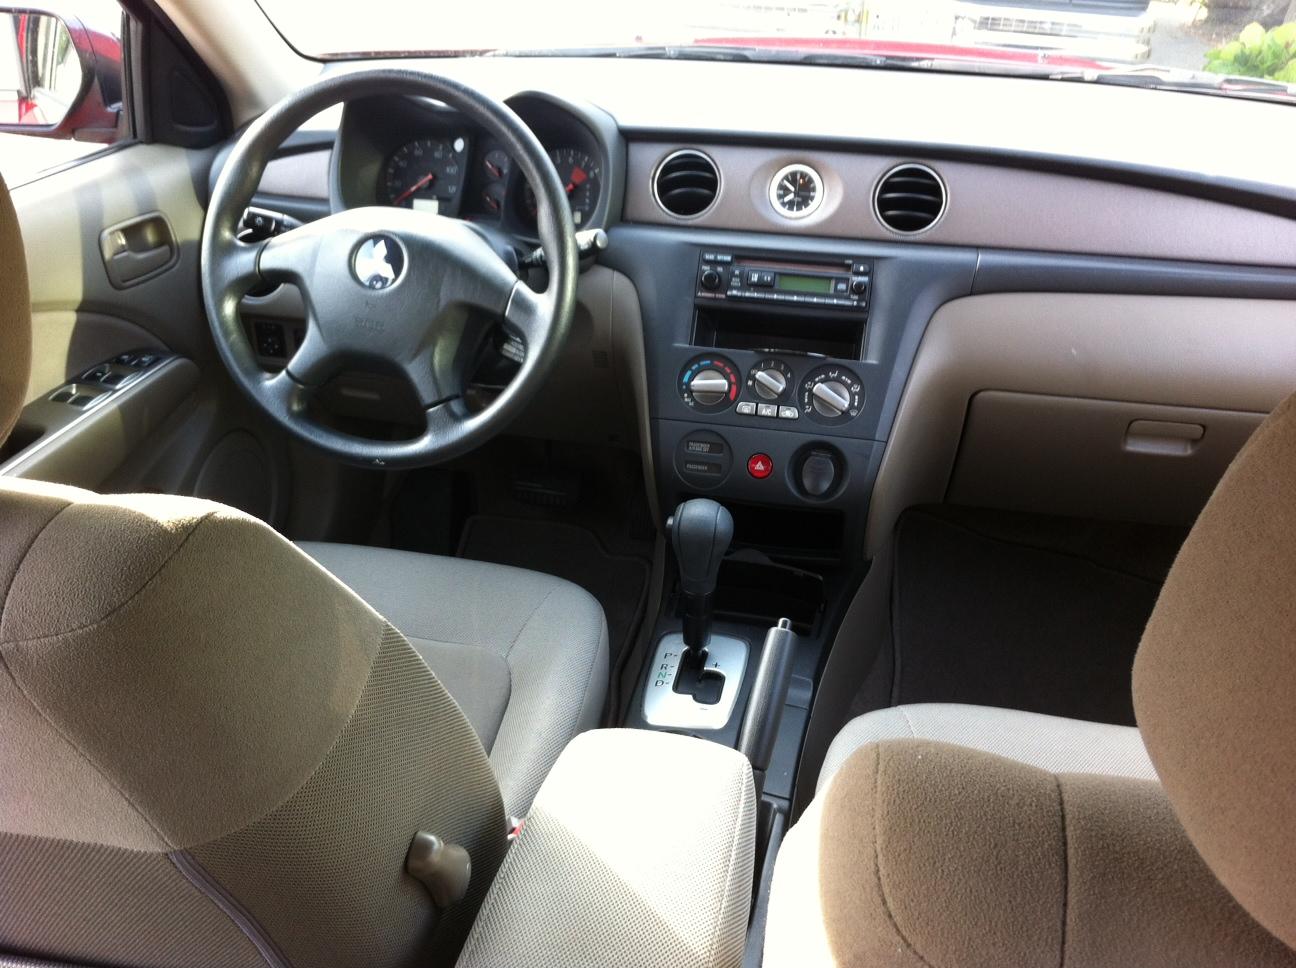 2006 mitsubishi outlander interior pictures cargurus for Mitsubishi outlander interior dimensions